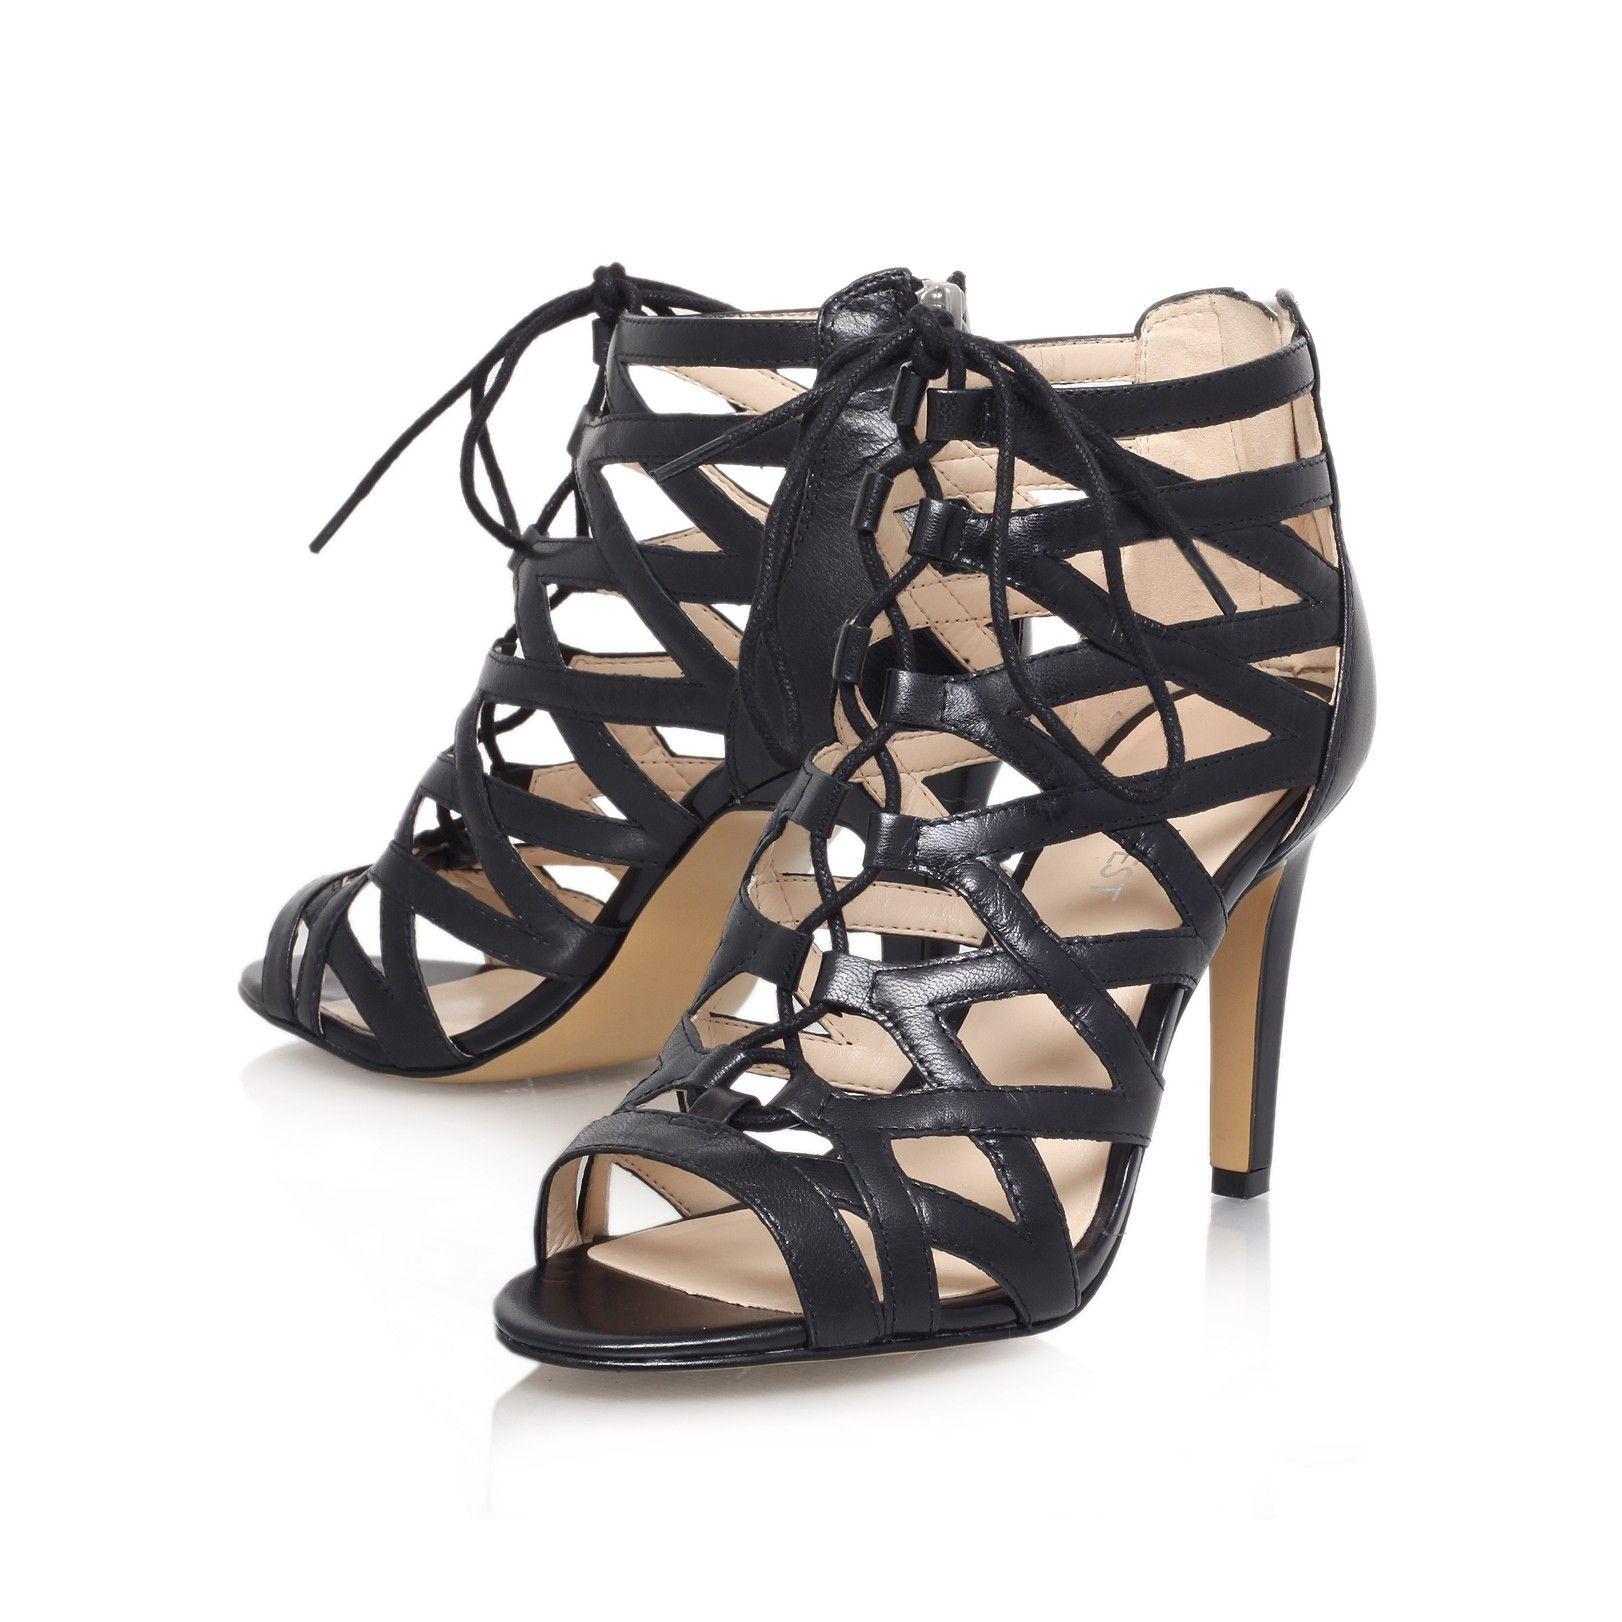 Black sandals nine west - Authority Black Shoe By Nine West Women Shoes Sandals High Heels